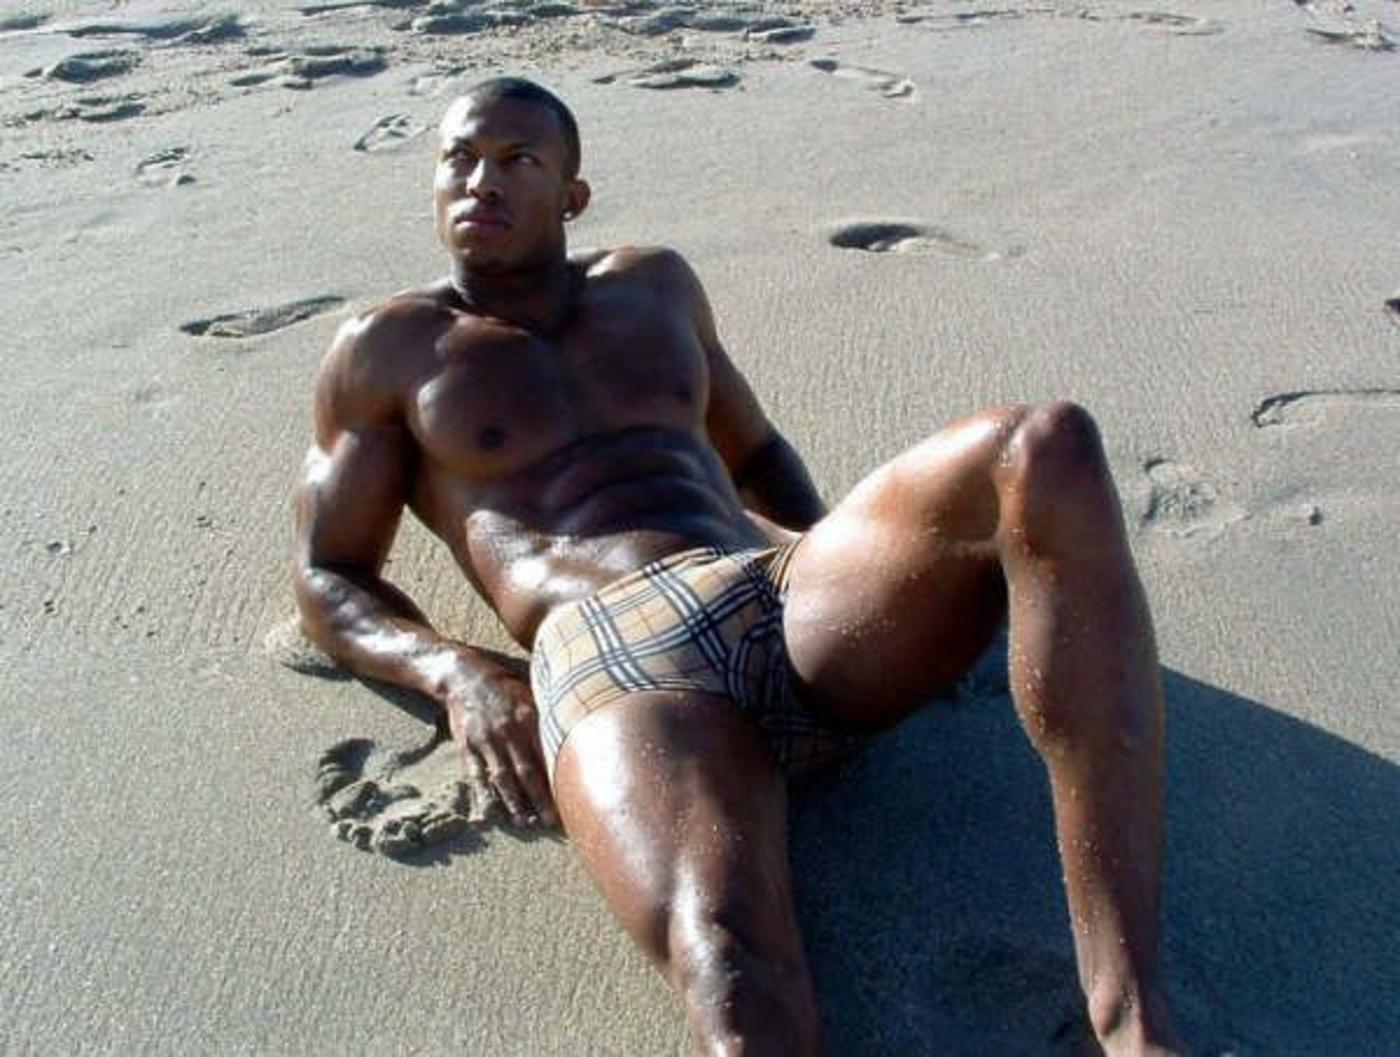 nude men dangerous public exposure